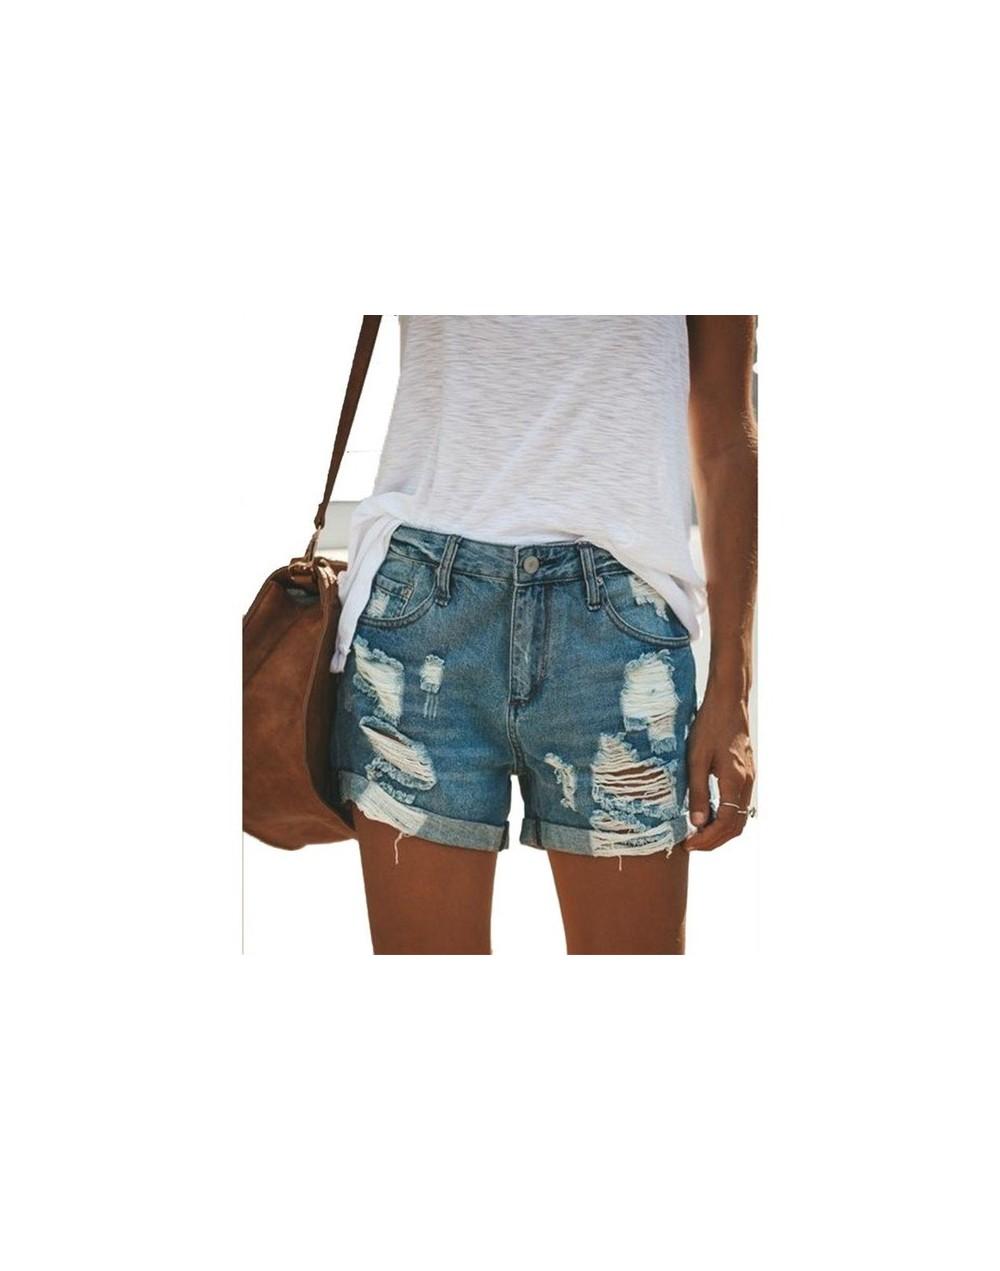 Summer Denim Shorts For Women Sexy Mini Shorts Women's Holes Jeans Blue High Waist Shorts Ripped Denim Short Female Plus Siz...